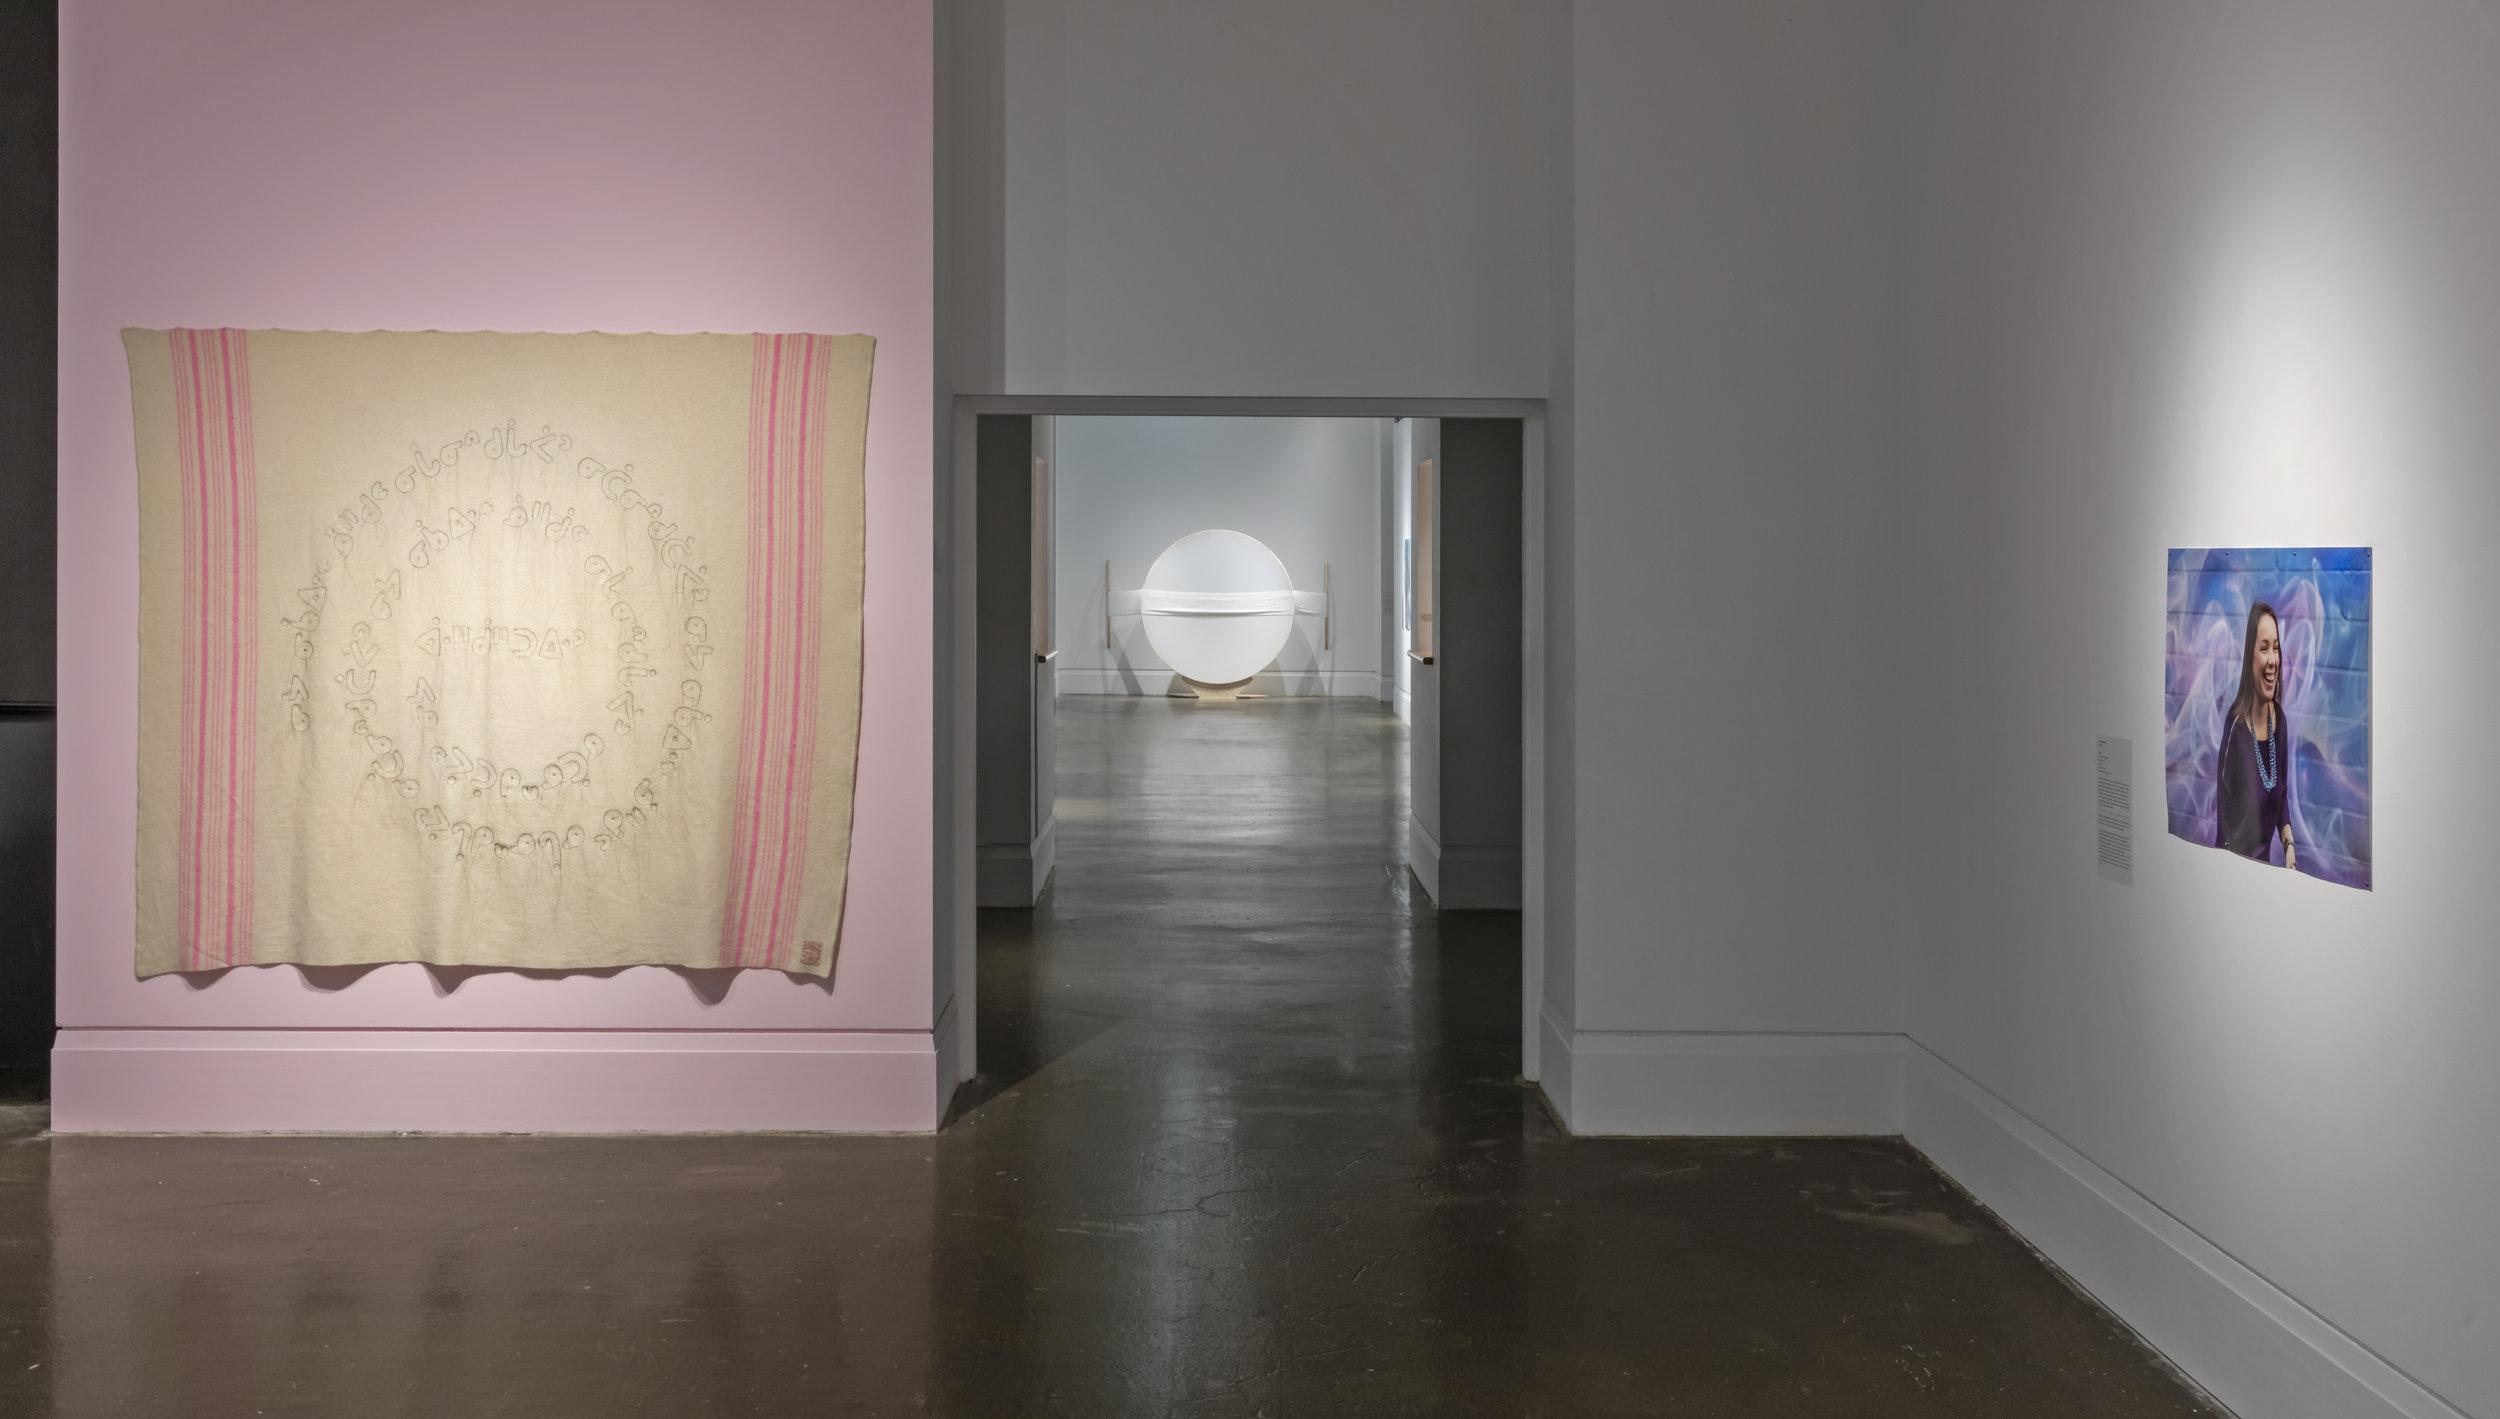 niigaanikwewag, Main Gallery, Art Gallery of Mississauga, Photo by Toni Hafkenschneid